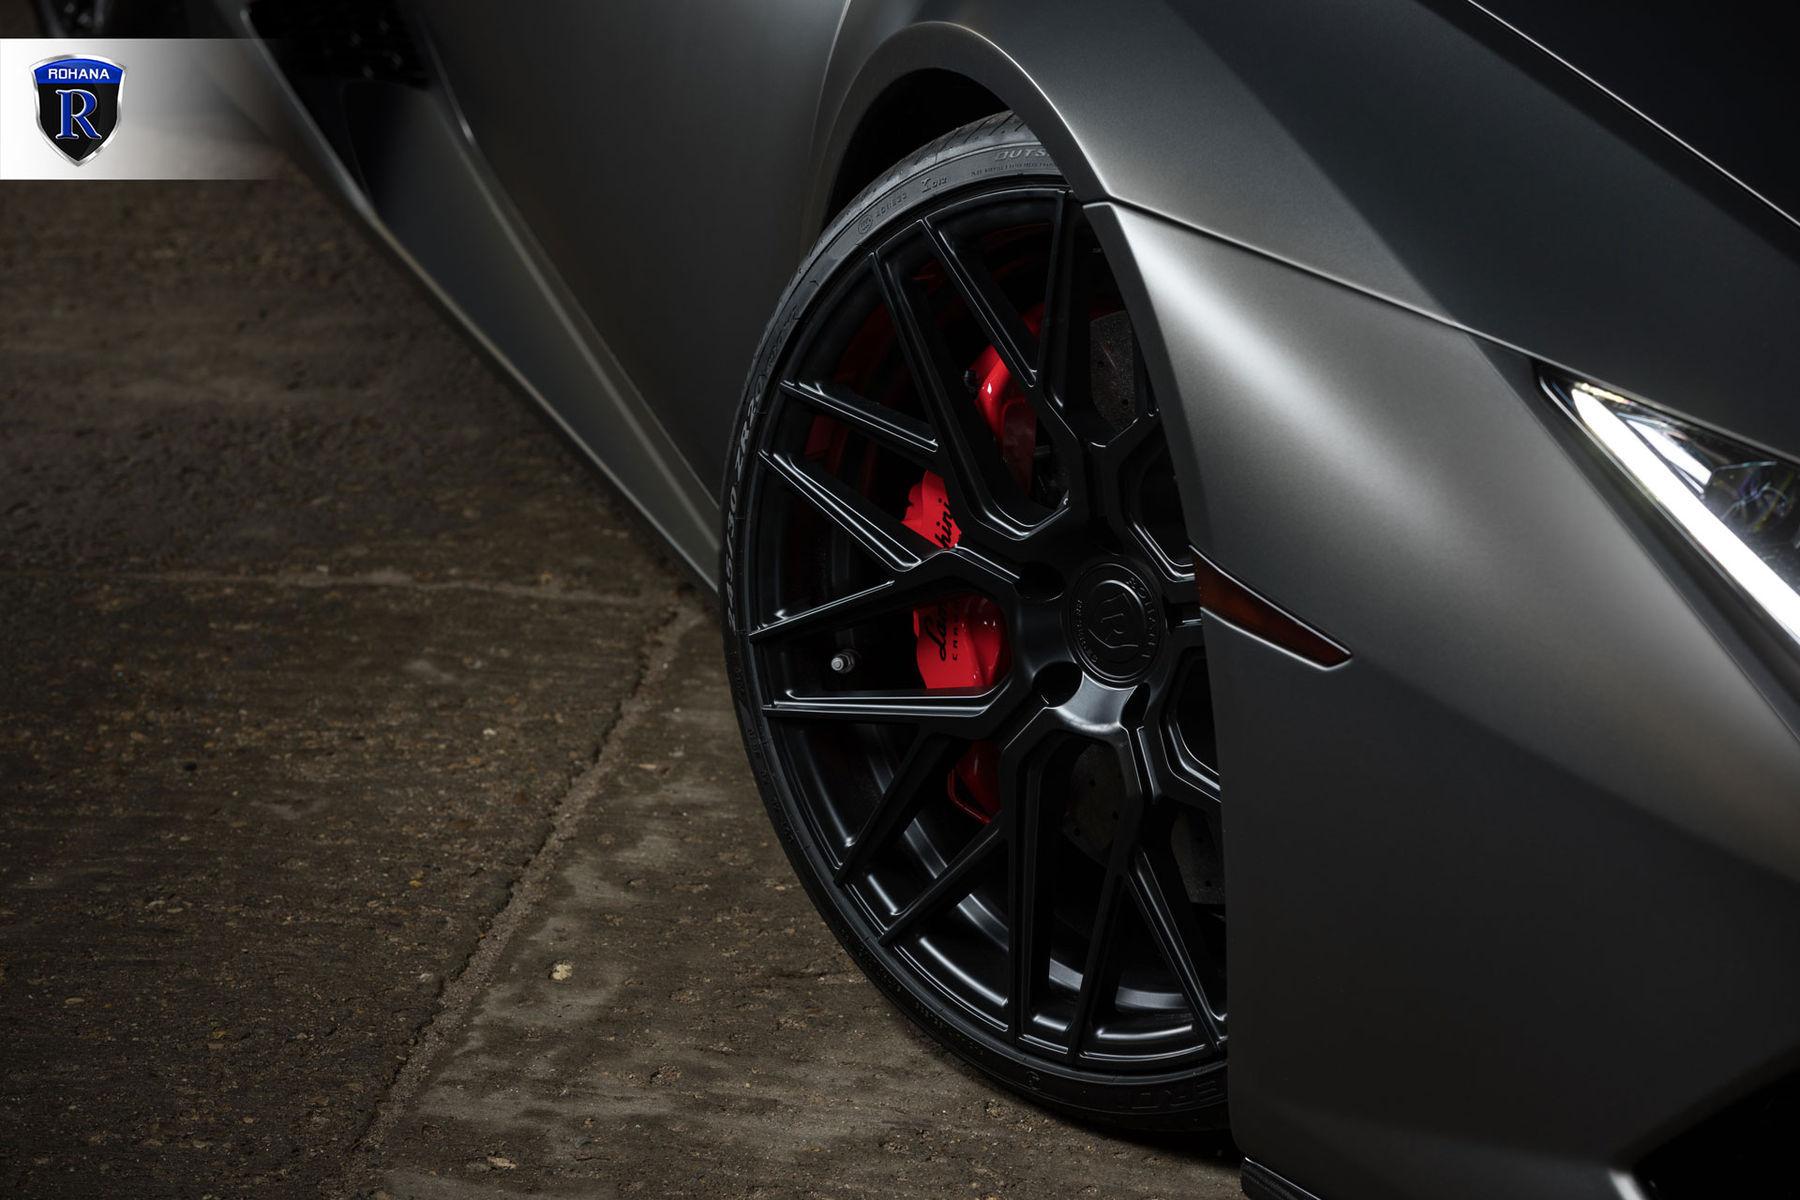 2016 Lamborghini Huracan   Matte Huracan - Black Spokes